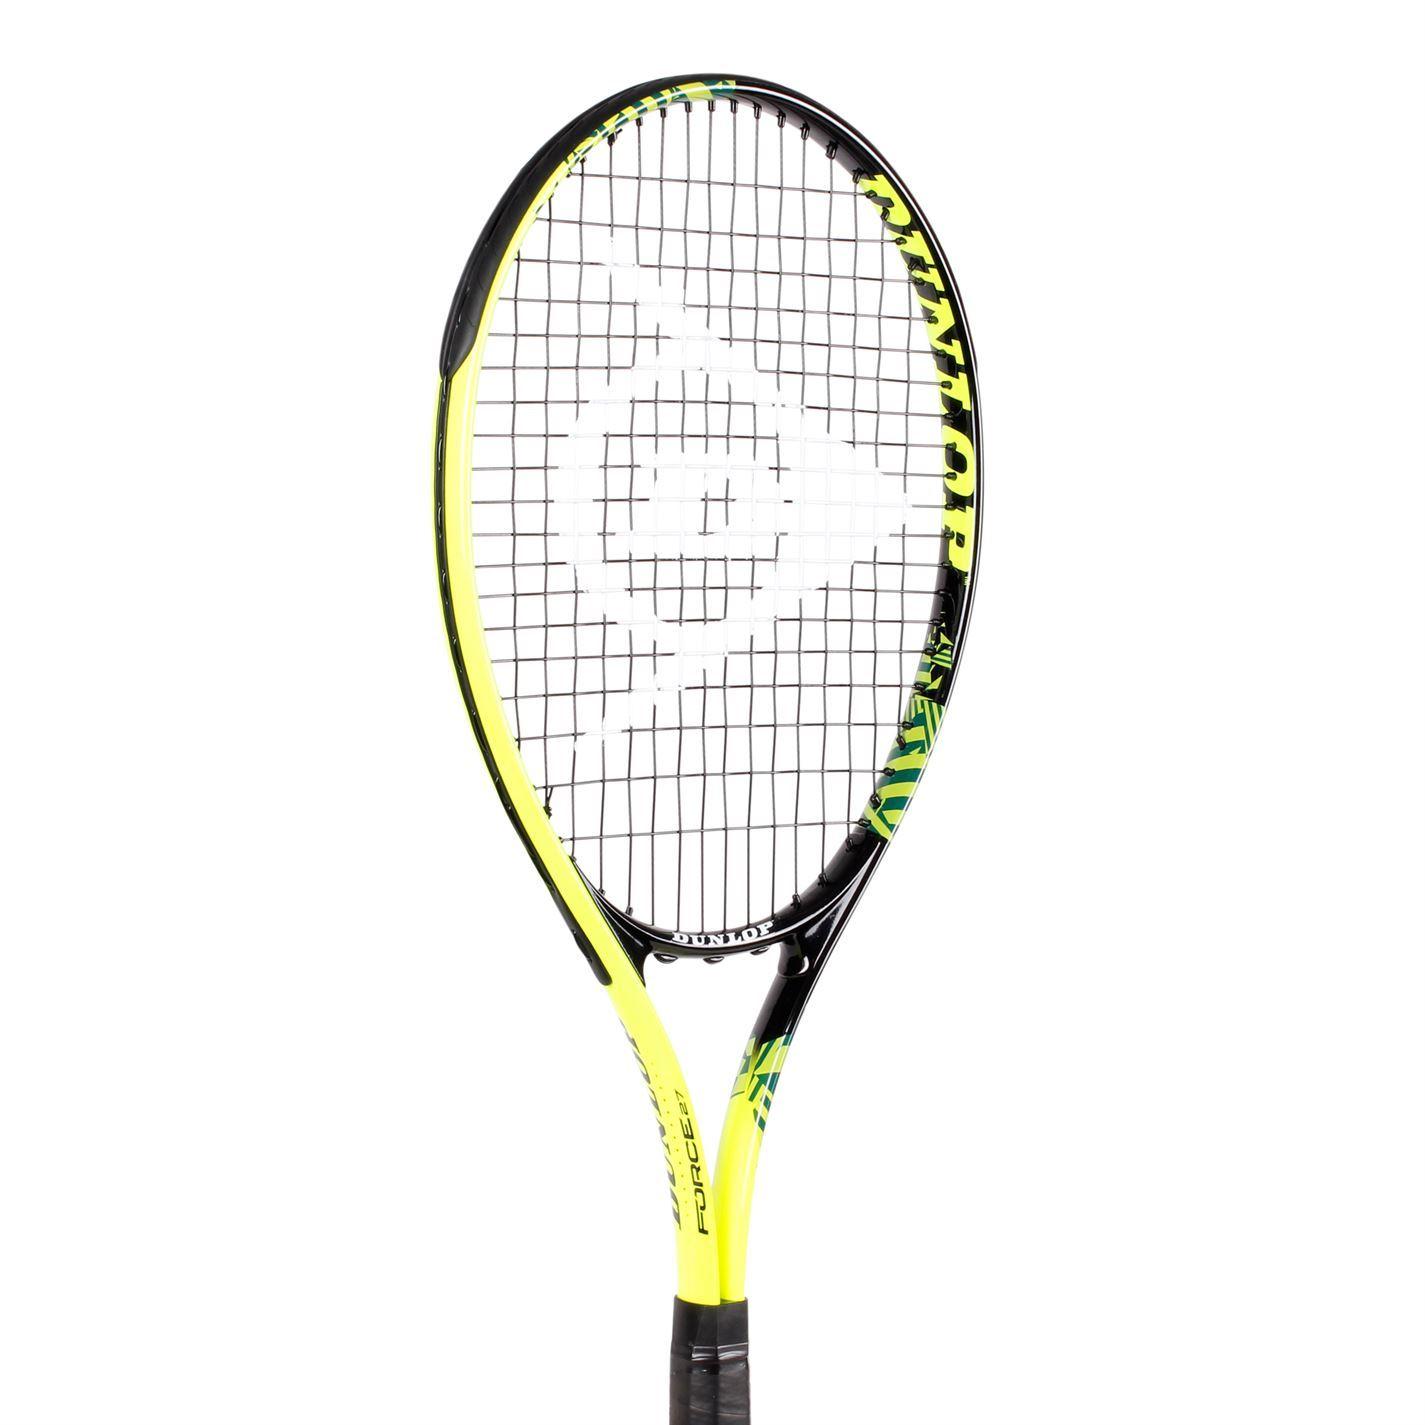 8931947efe3 Details about Dunlop Force Tennis Racket Sport Training Accessories